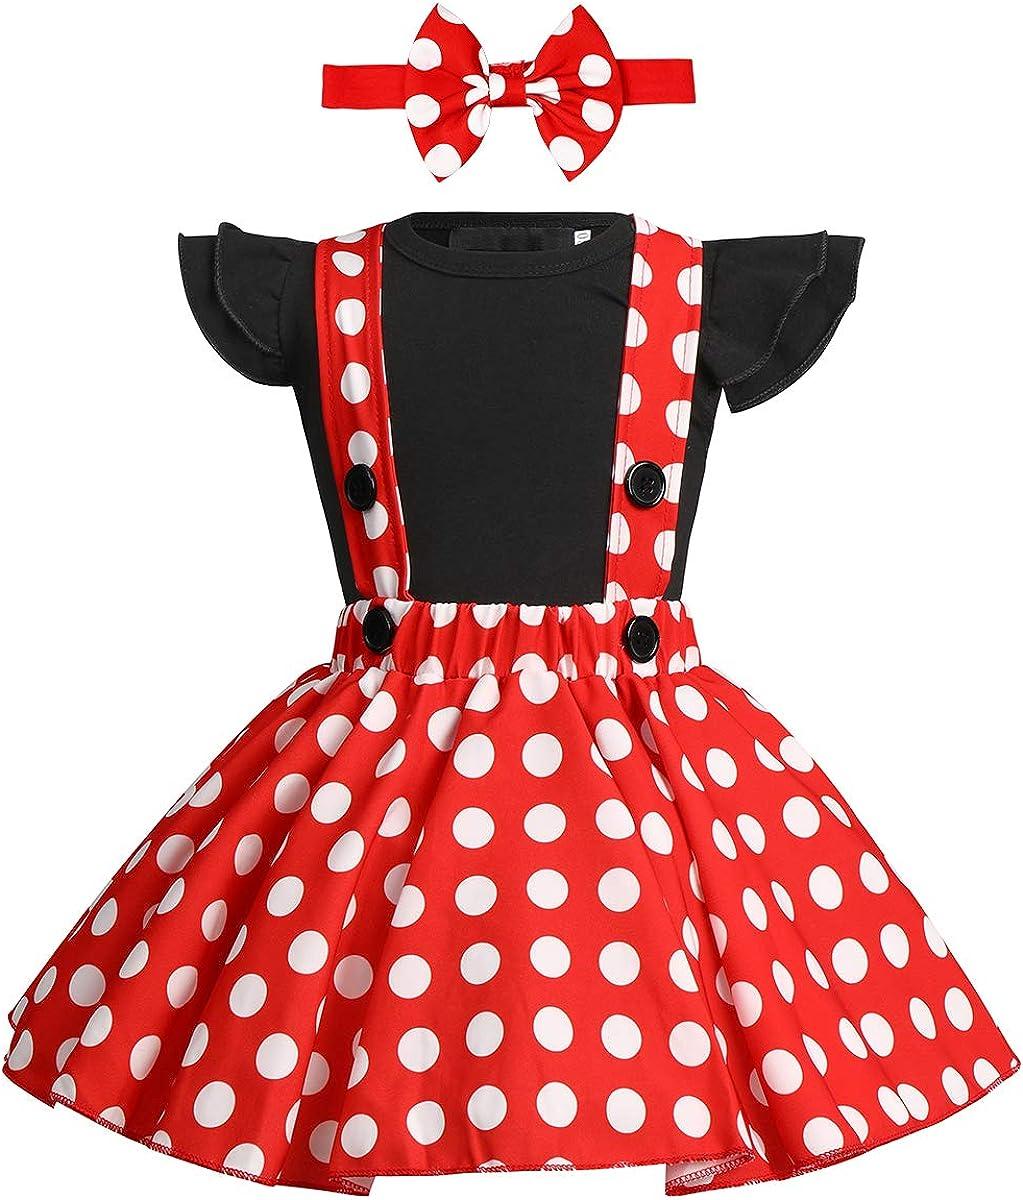 ODASDO Baby Girl Suspender Dress Set Ruffle Sleeve Romper + Polka Dots Overall Strap Tutu Skirt + Bowknot Headband